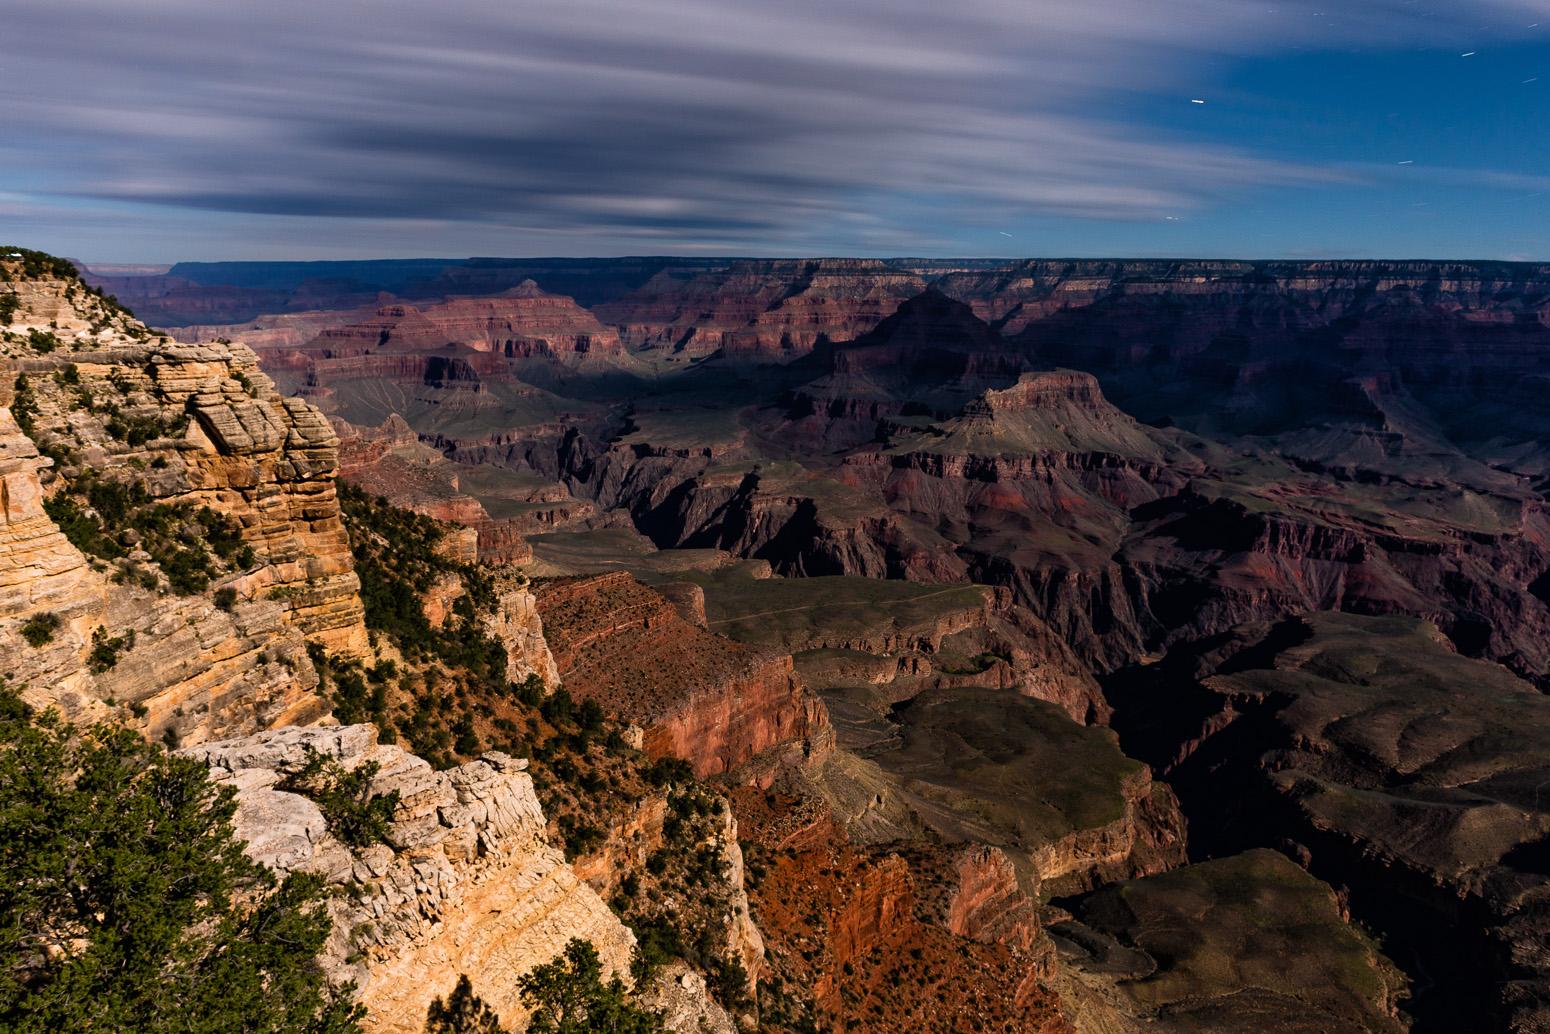 Grand Canyon, Mather Point, Moonlight Shot, South Rim, Arizona, USA